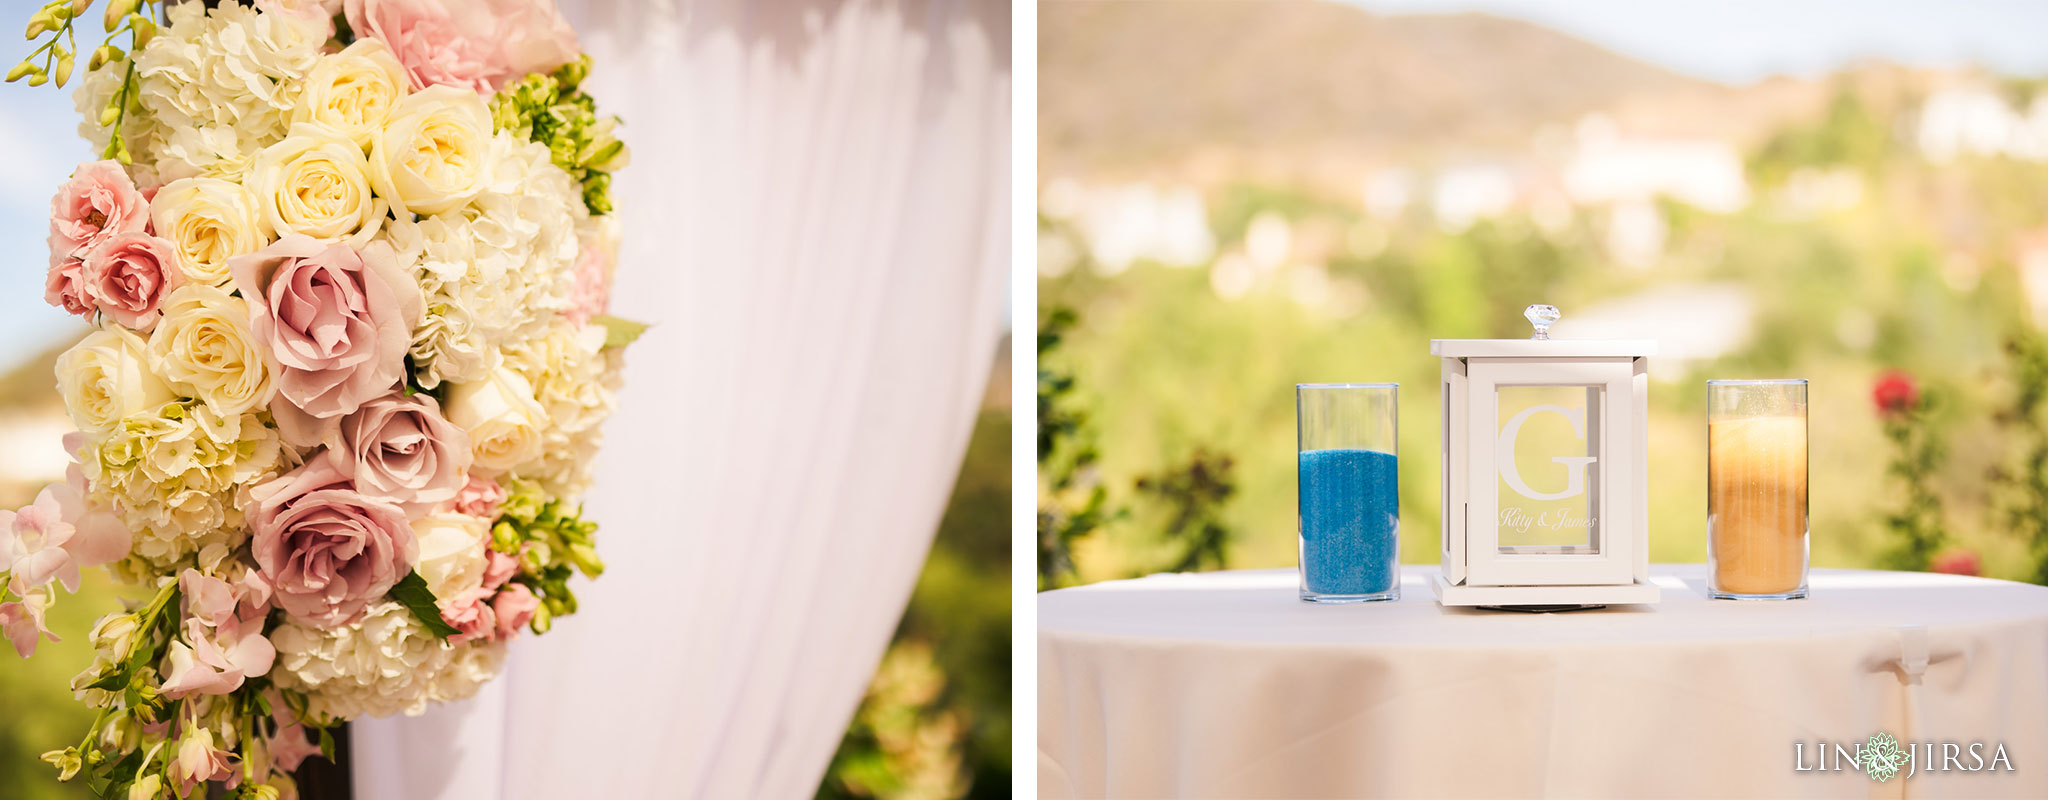 021 sherwood country club ventura county wedding ceremony photography